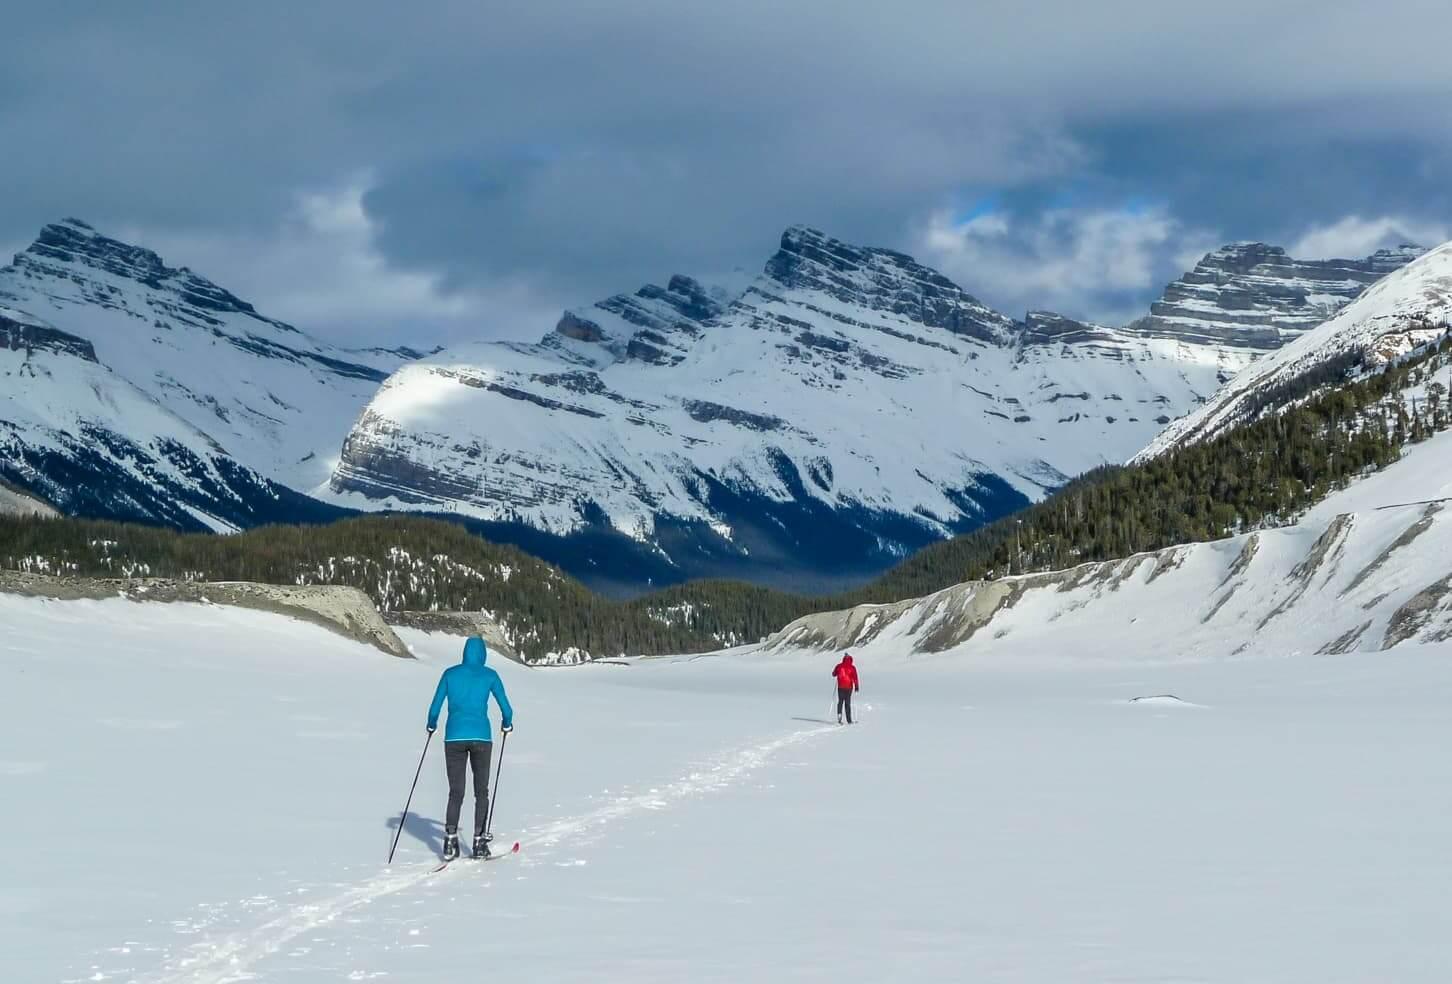 Cross country ski trails in Banff National Park - Saskatchewan Glacier